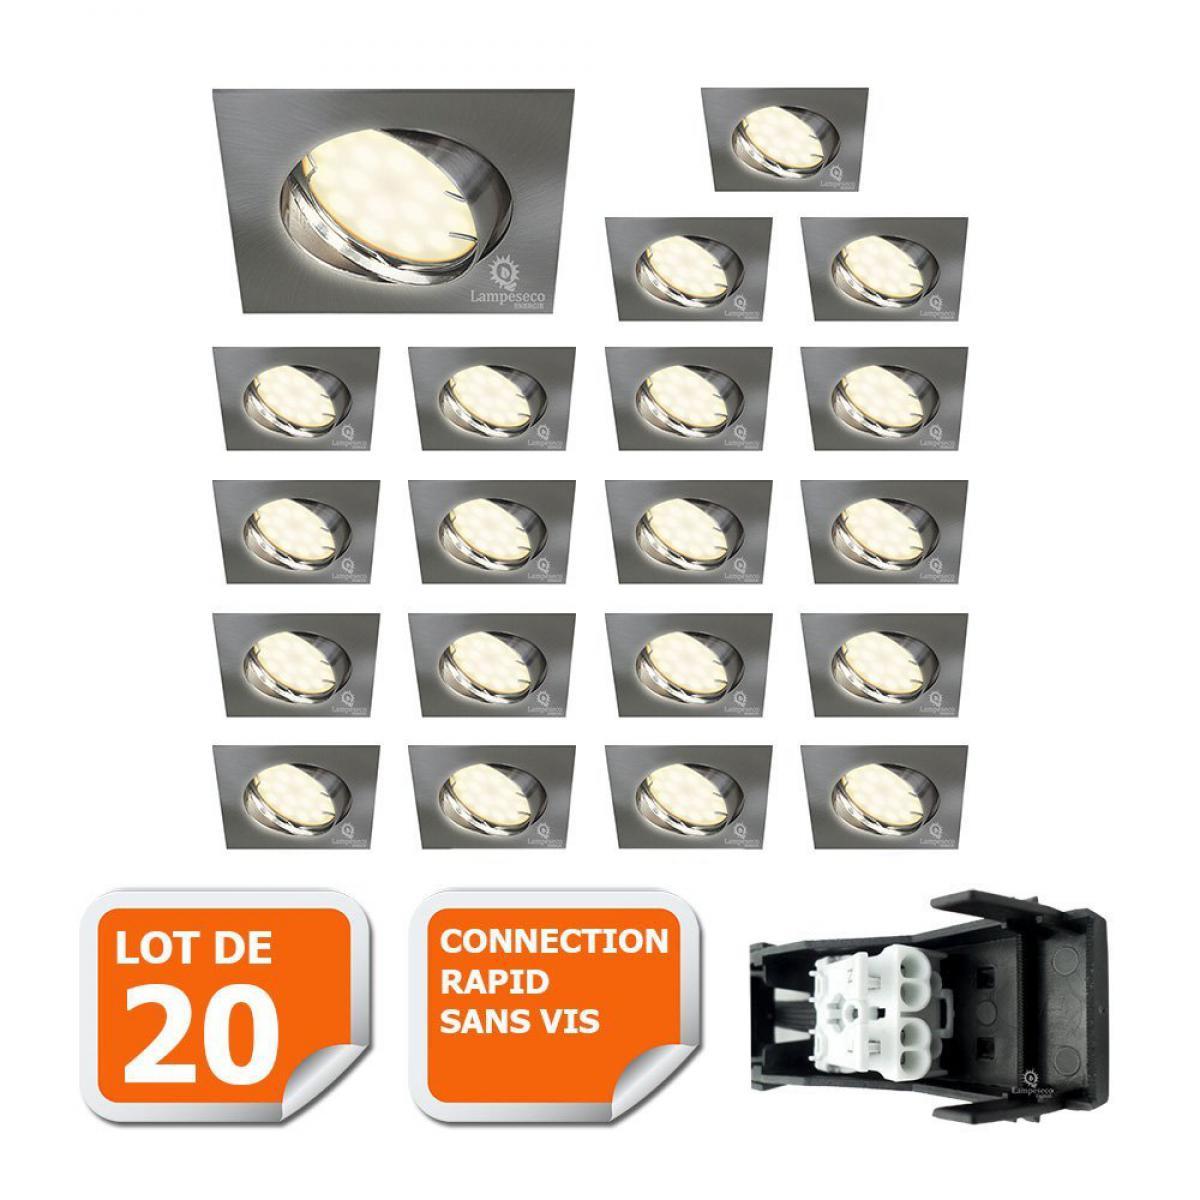 Lampesecoenergie LOT DE 20 SPOT ENCASTRABLE ORIENTABLE LED CARRE ALU BROSSE GU10 230V eq. 50W BLANC NEUTRE